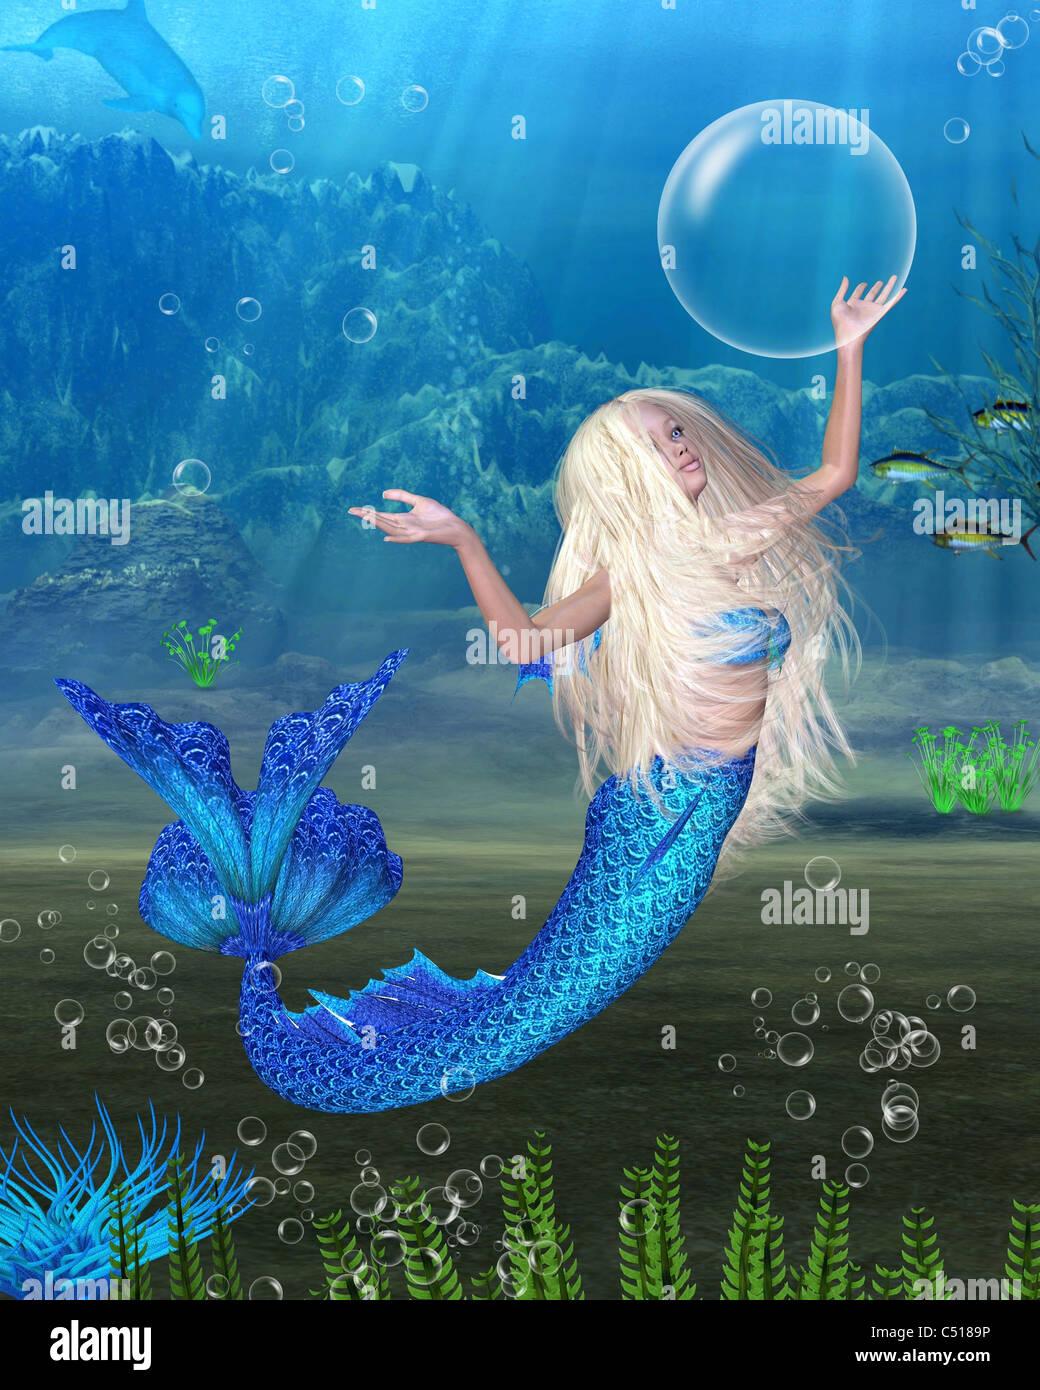 Pretty Blonde Mermaid with underwater background - Stock Image